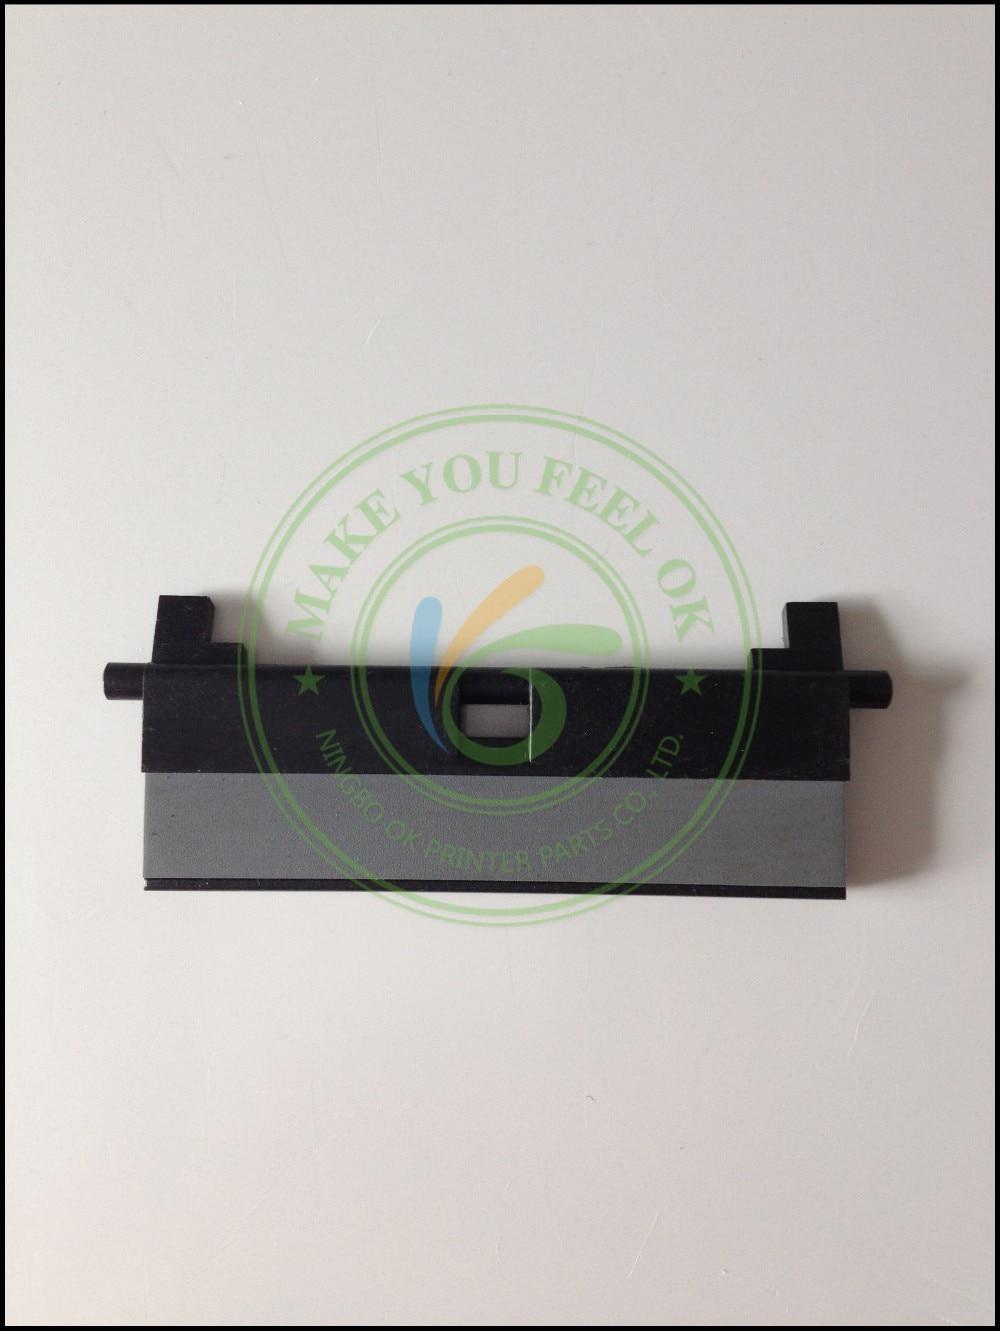 10 шт. X RM1-1298-000 RM1-1298 разделительная пластина для HP 1160 1320 2410 2420 2430 3390 3392 2727